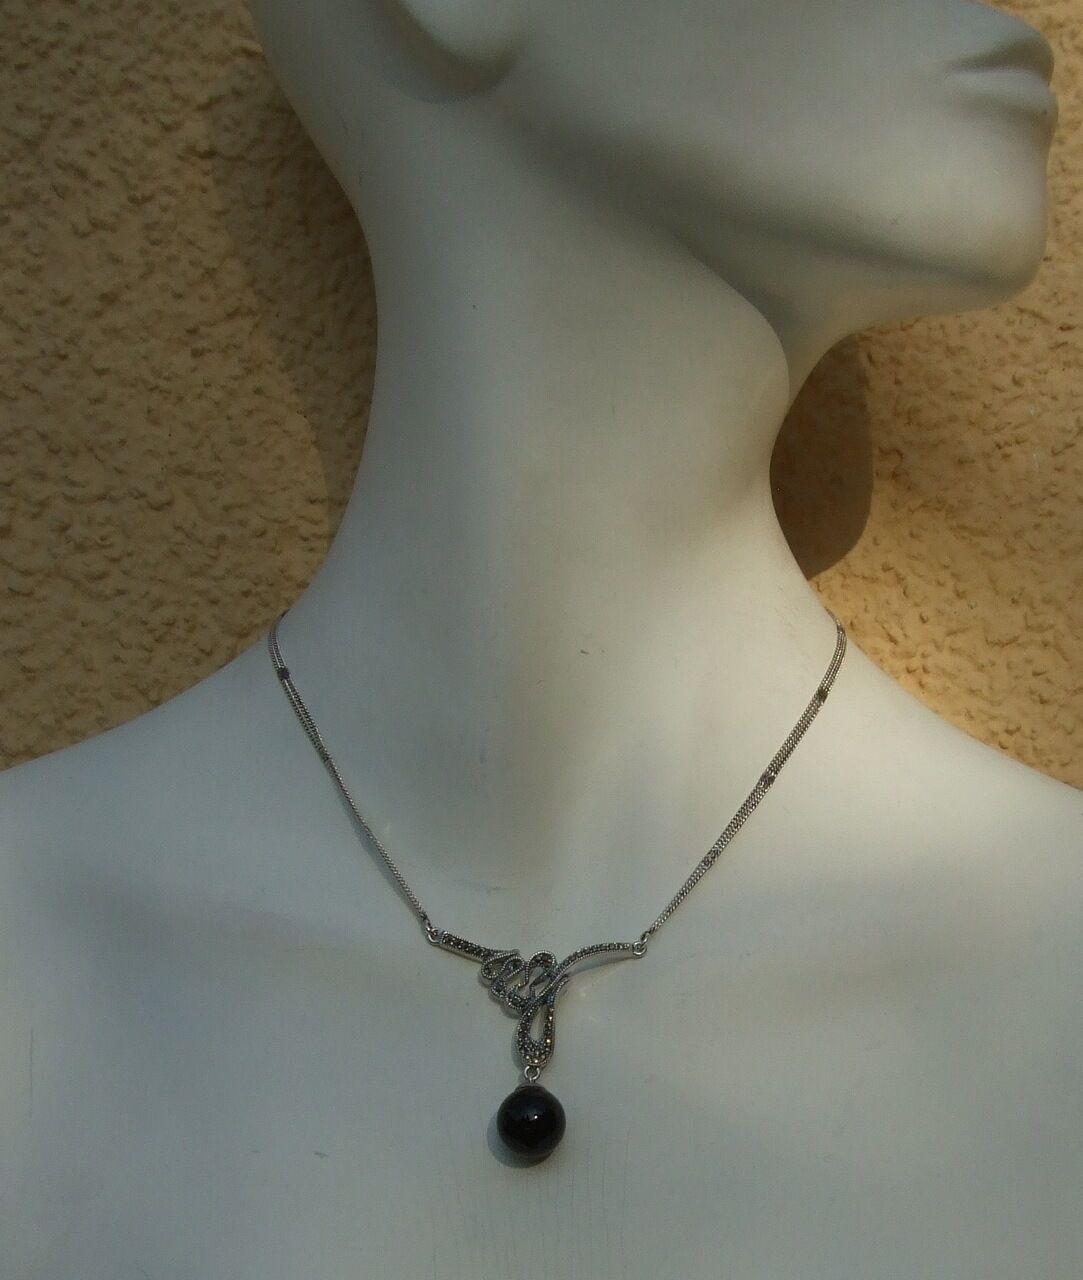 Onyx Onyx Onyx A SFERA NERO 40x splendente Markasit 925 argentoo Catena Big nero Magic Ball eee6c1